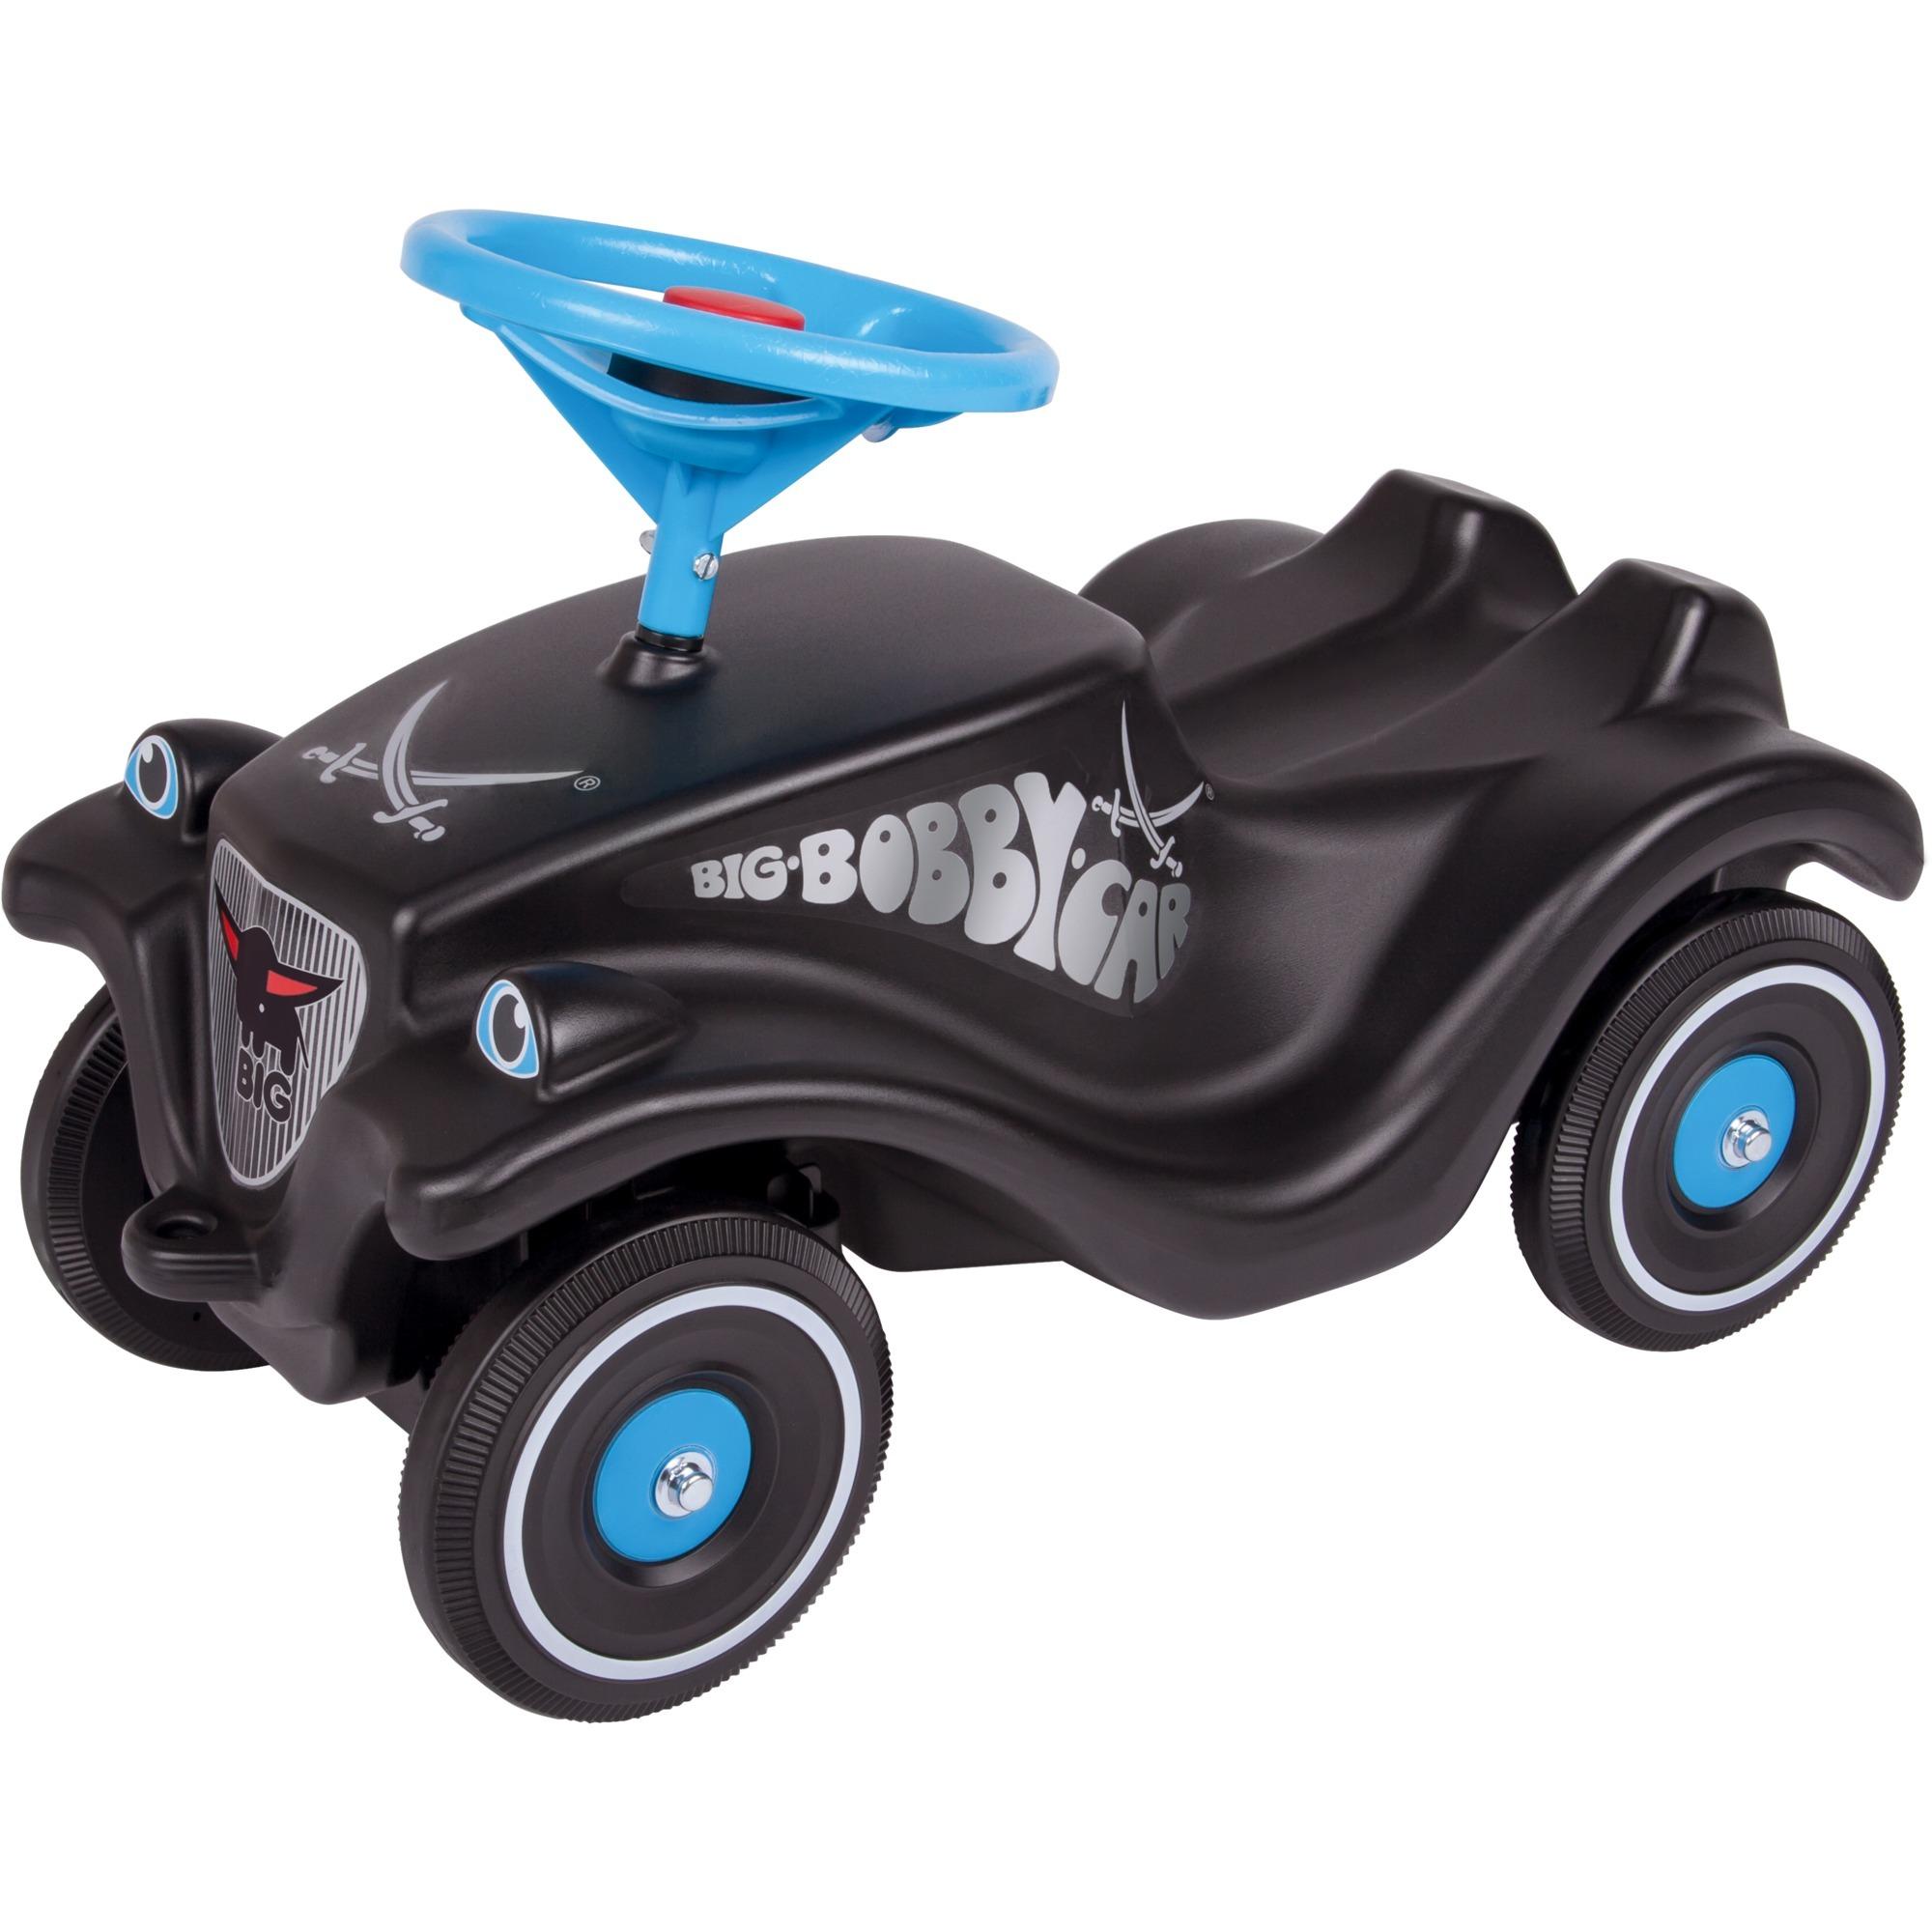 800056093 Apertura por empuje Coche juguete de montar, Tobogán